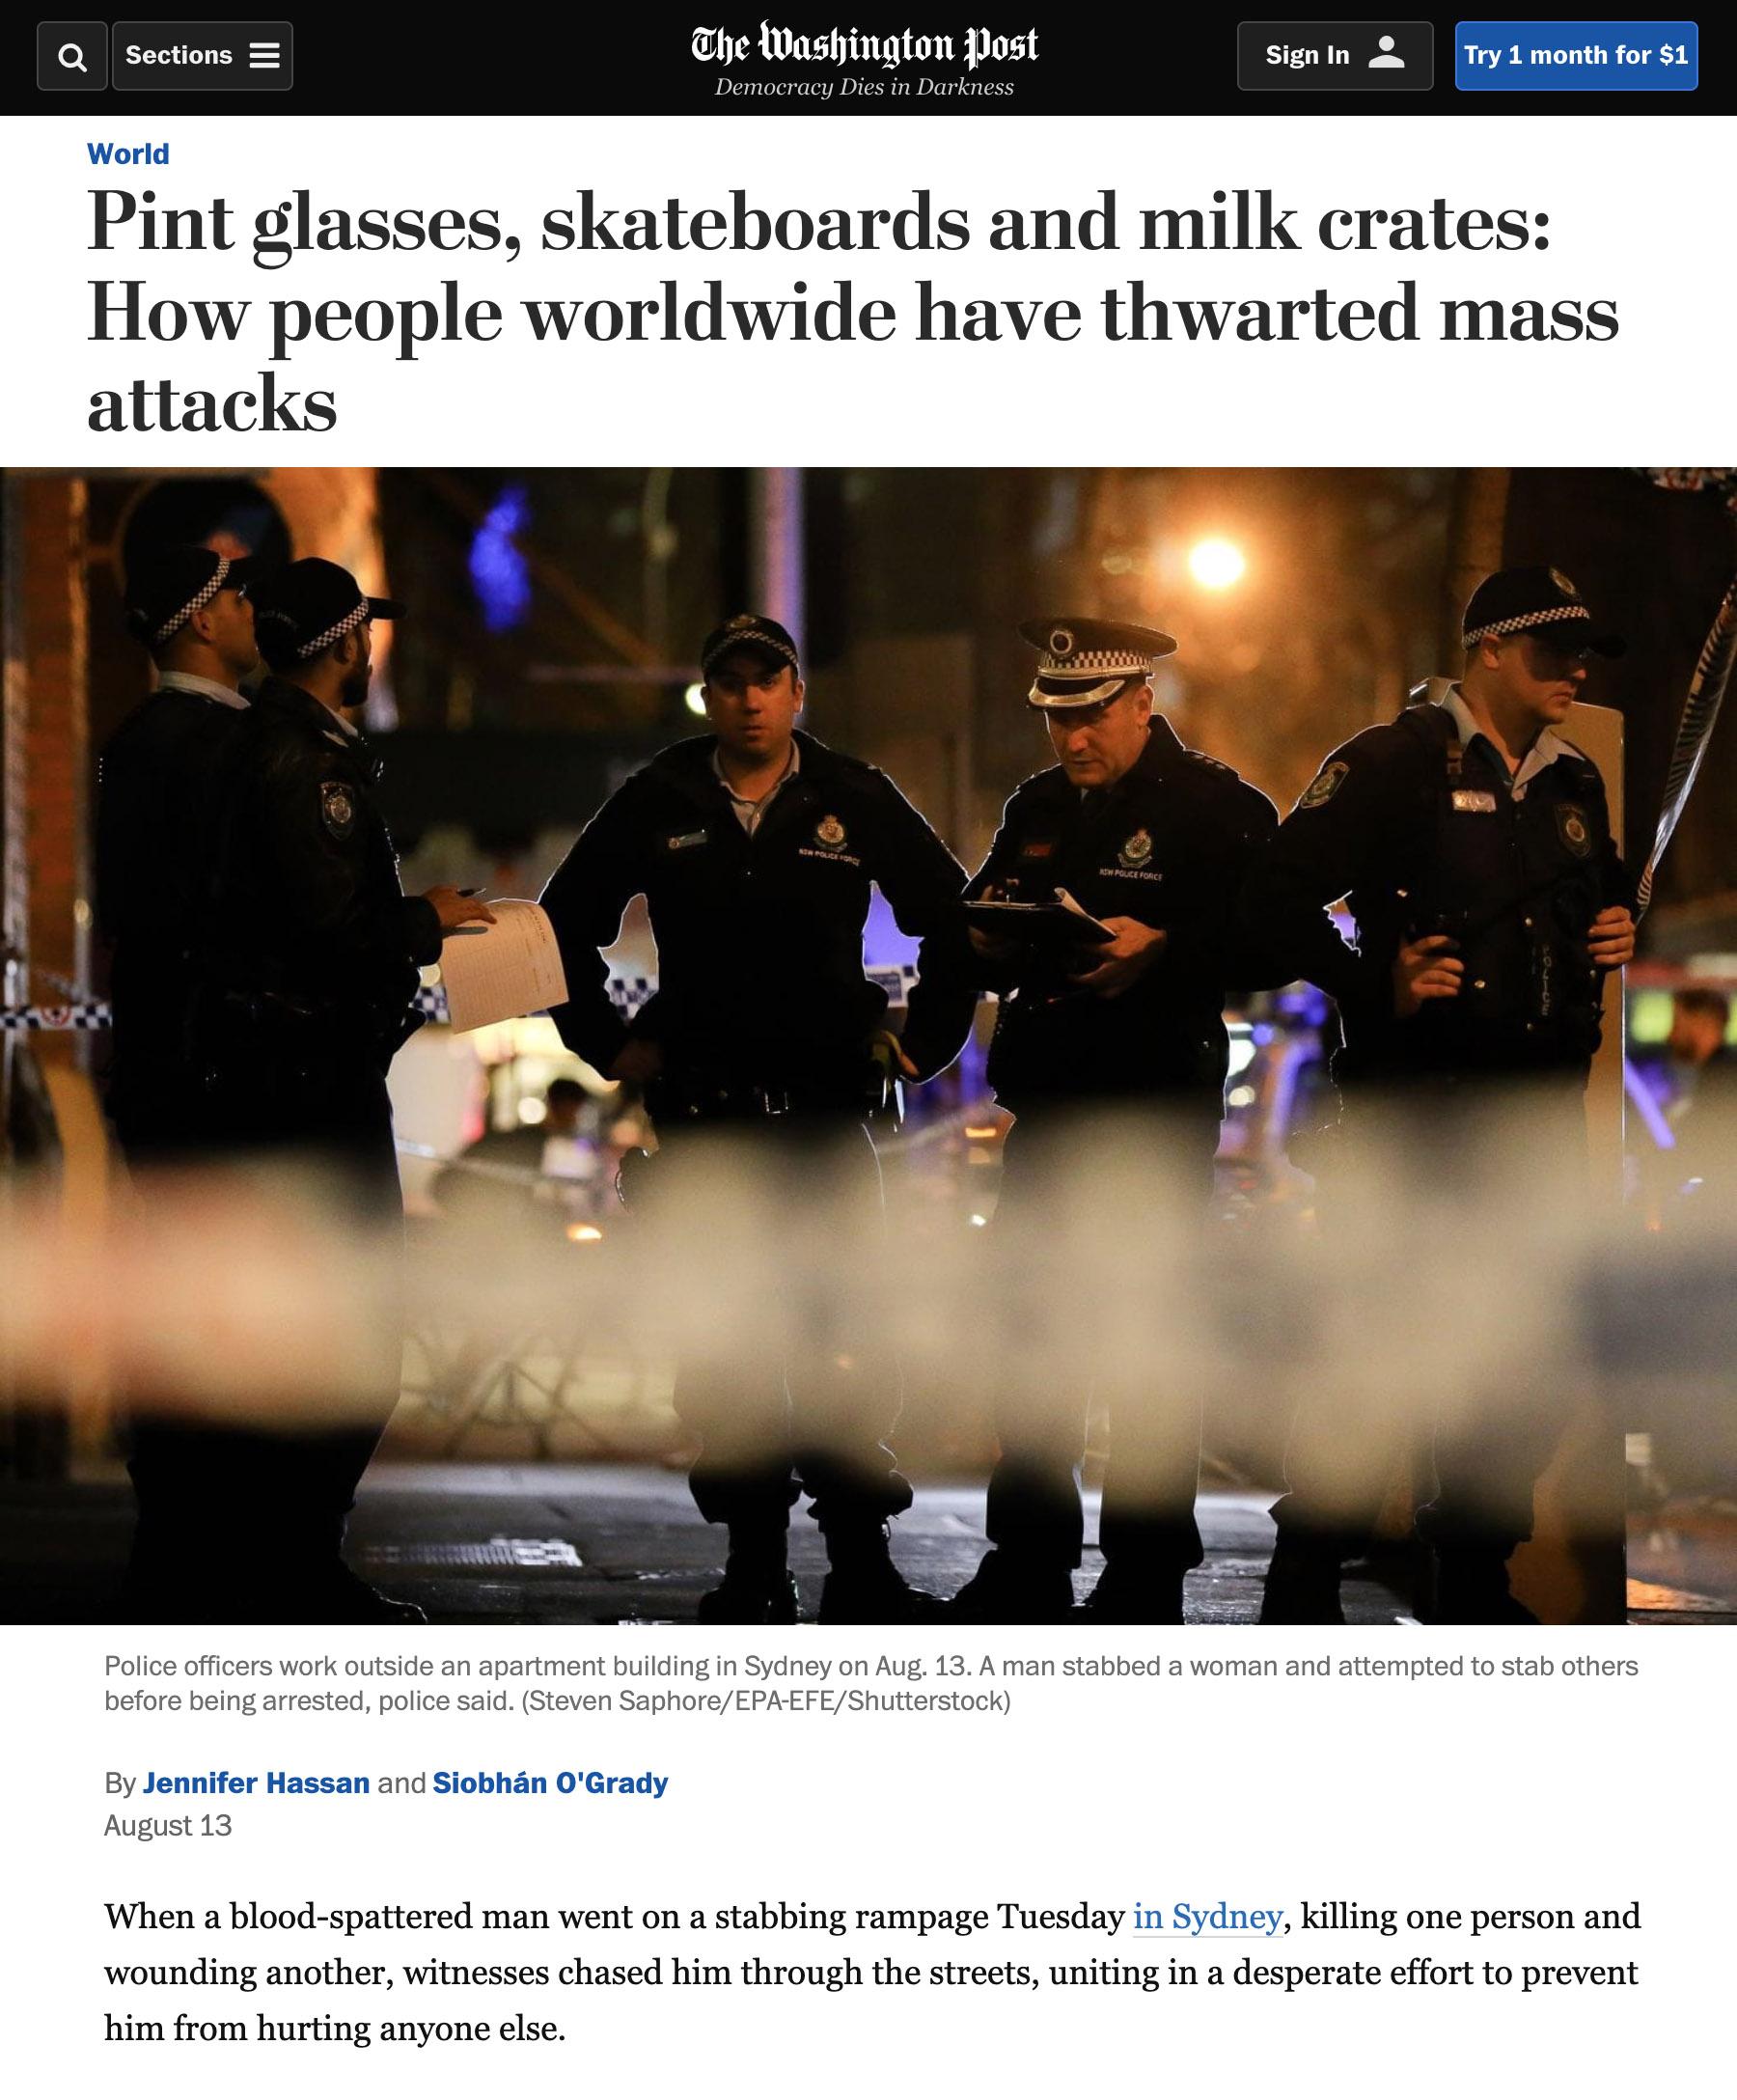 2019-08-13 Washingtonpost.com pint-glasses-skateboards-milk-crates.jpg